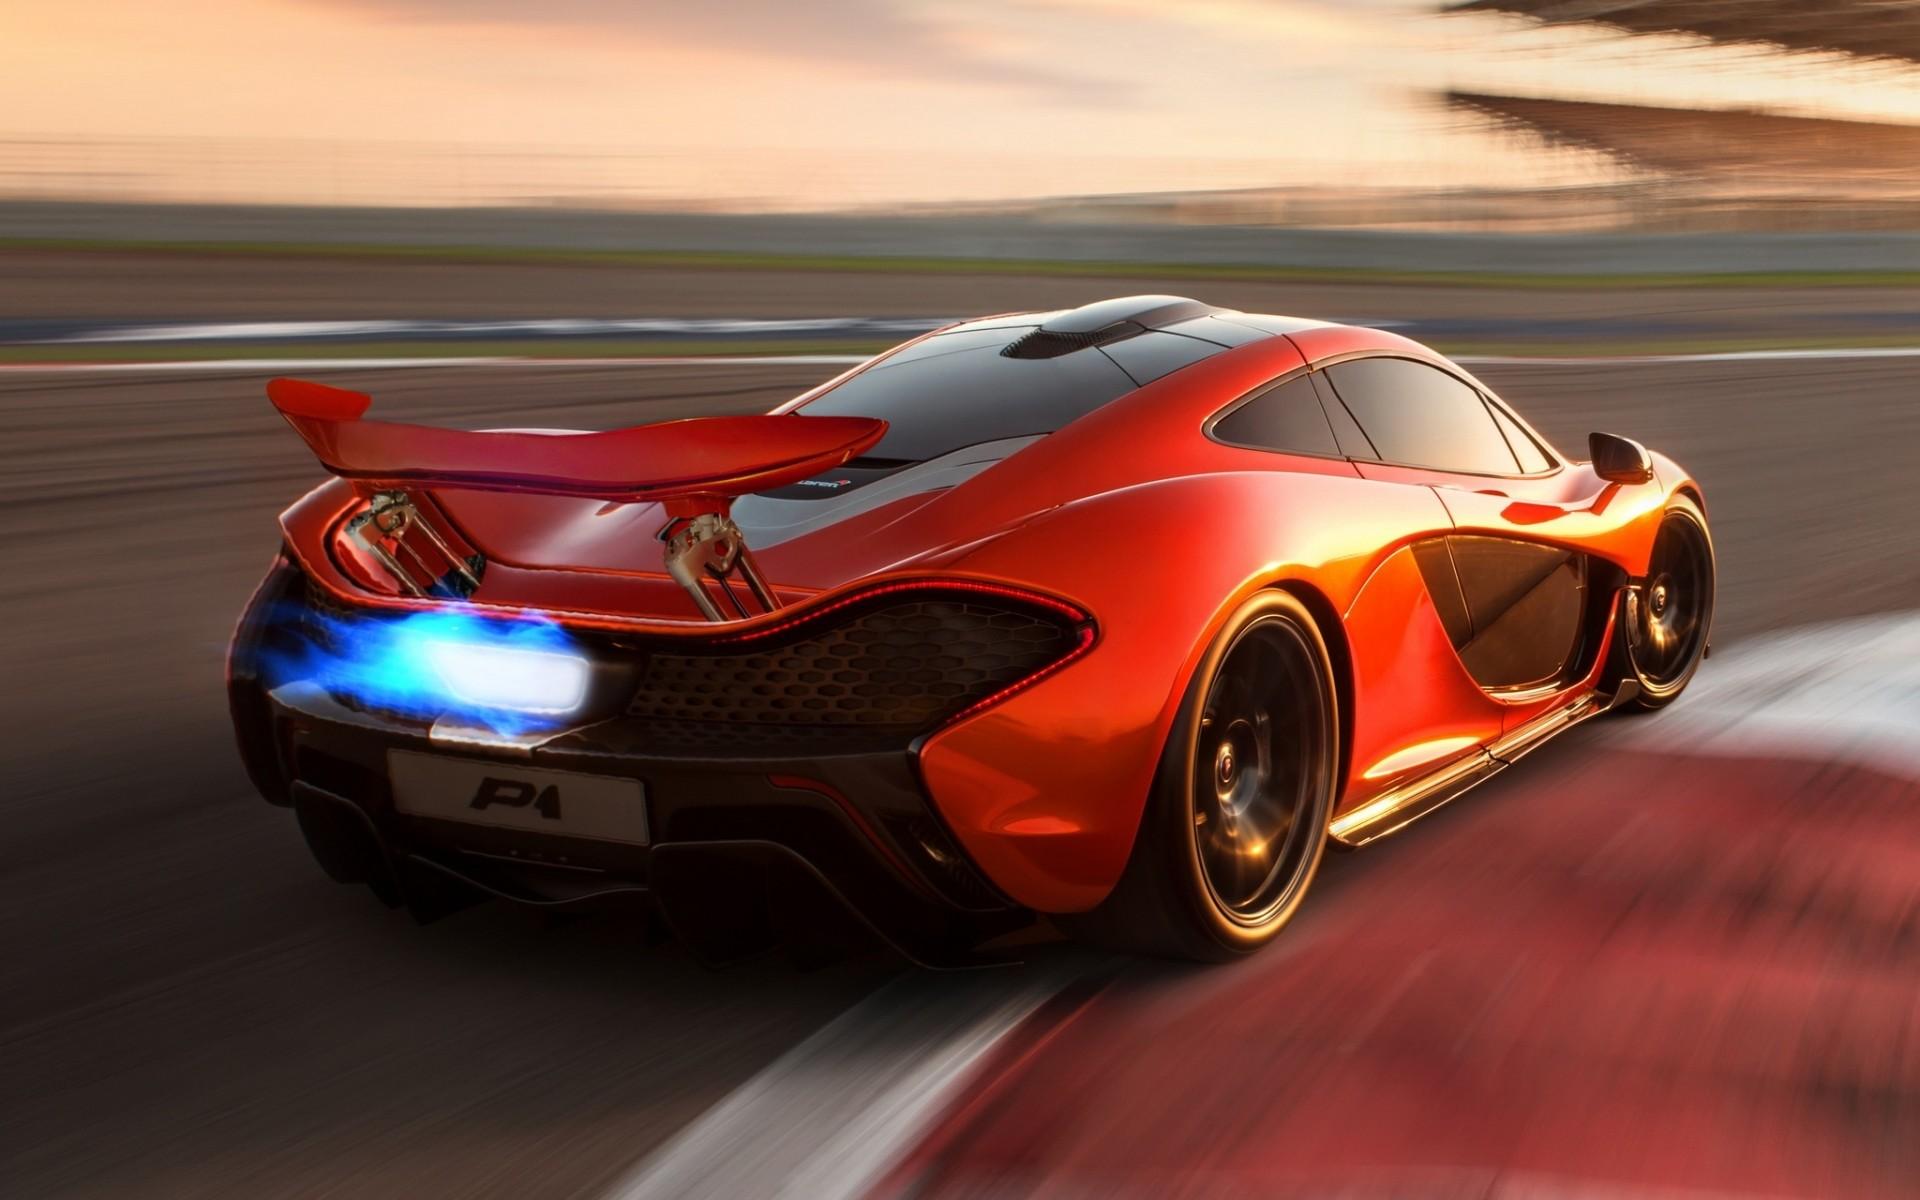 Res: 1920x1200, McLaren P1 Orange Wallpaper